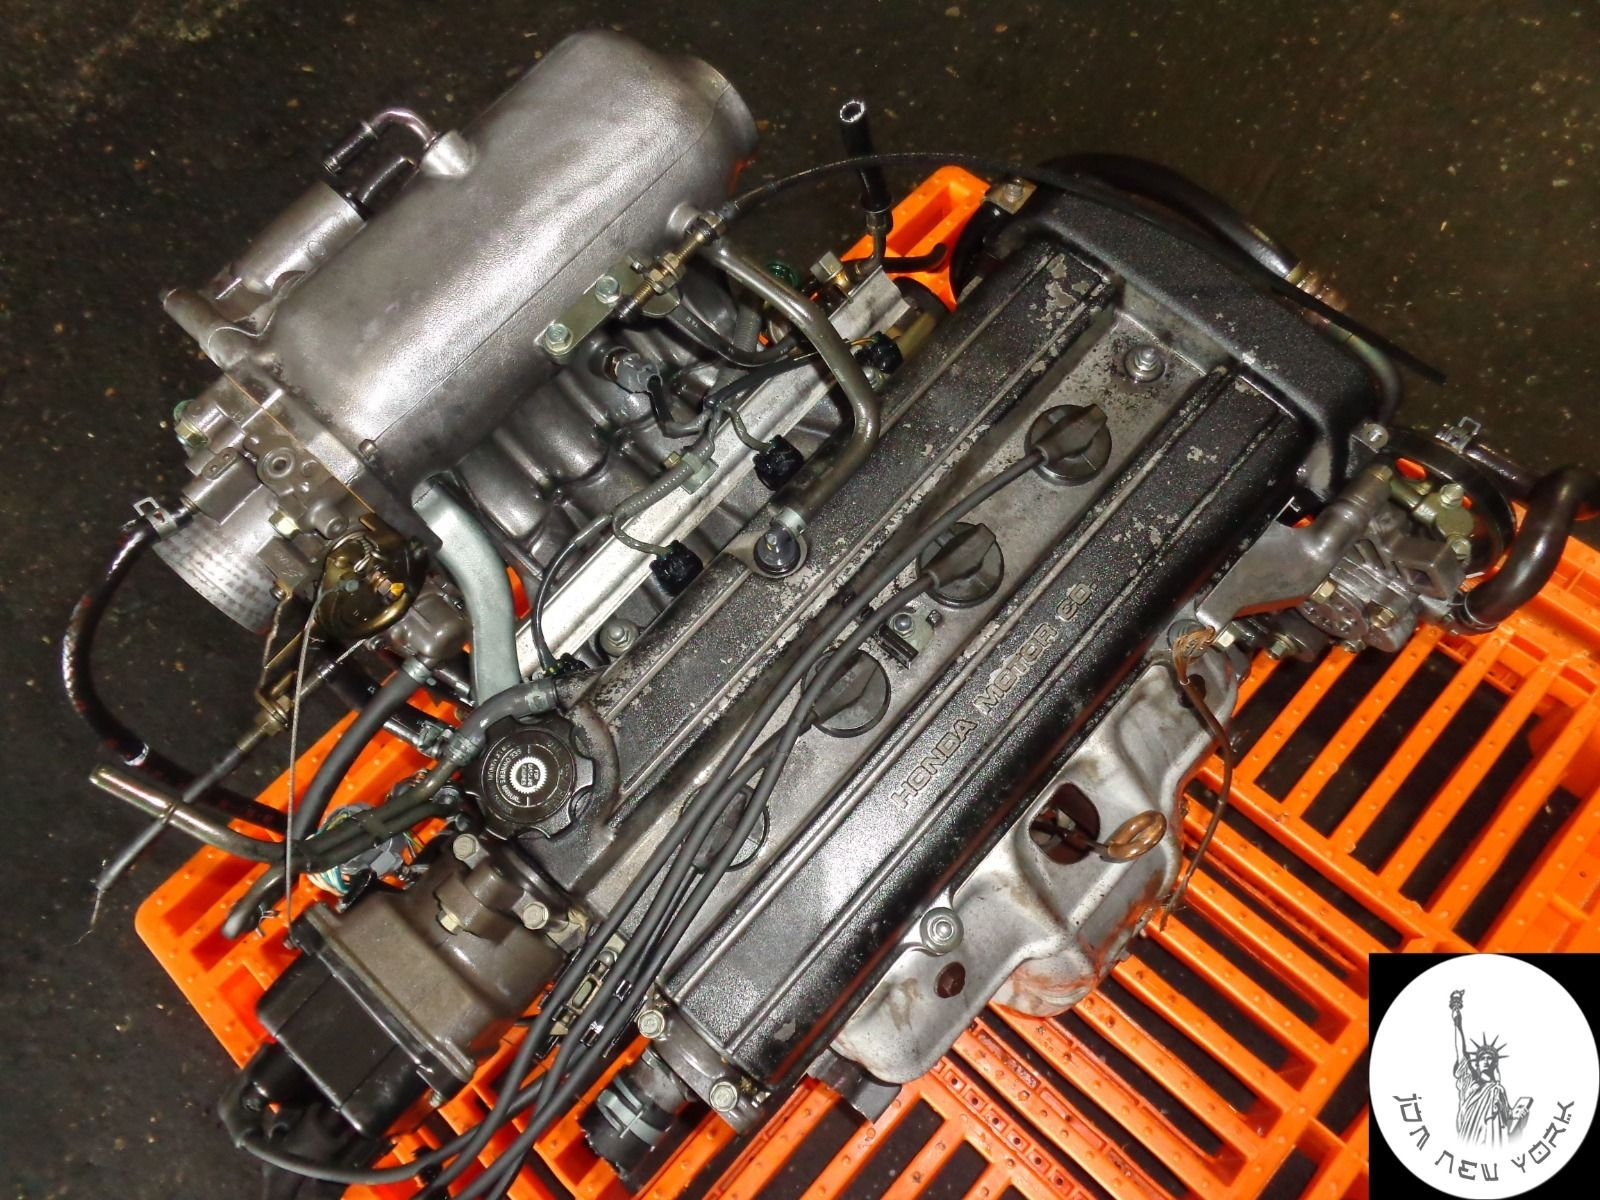 Honda crv crx civic acura integra 2 0l dohc engine jdm for Honda crv engine size